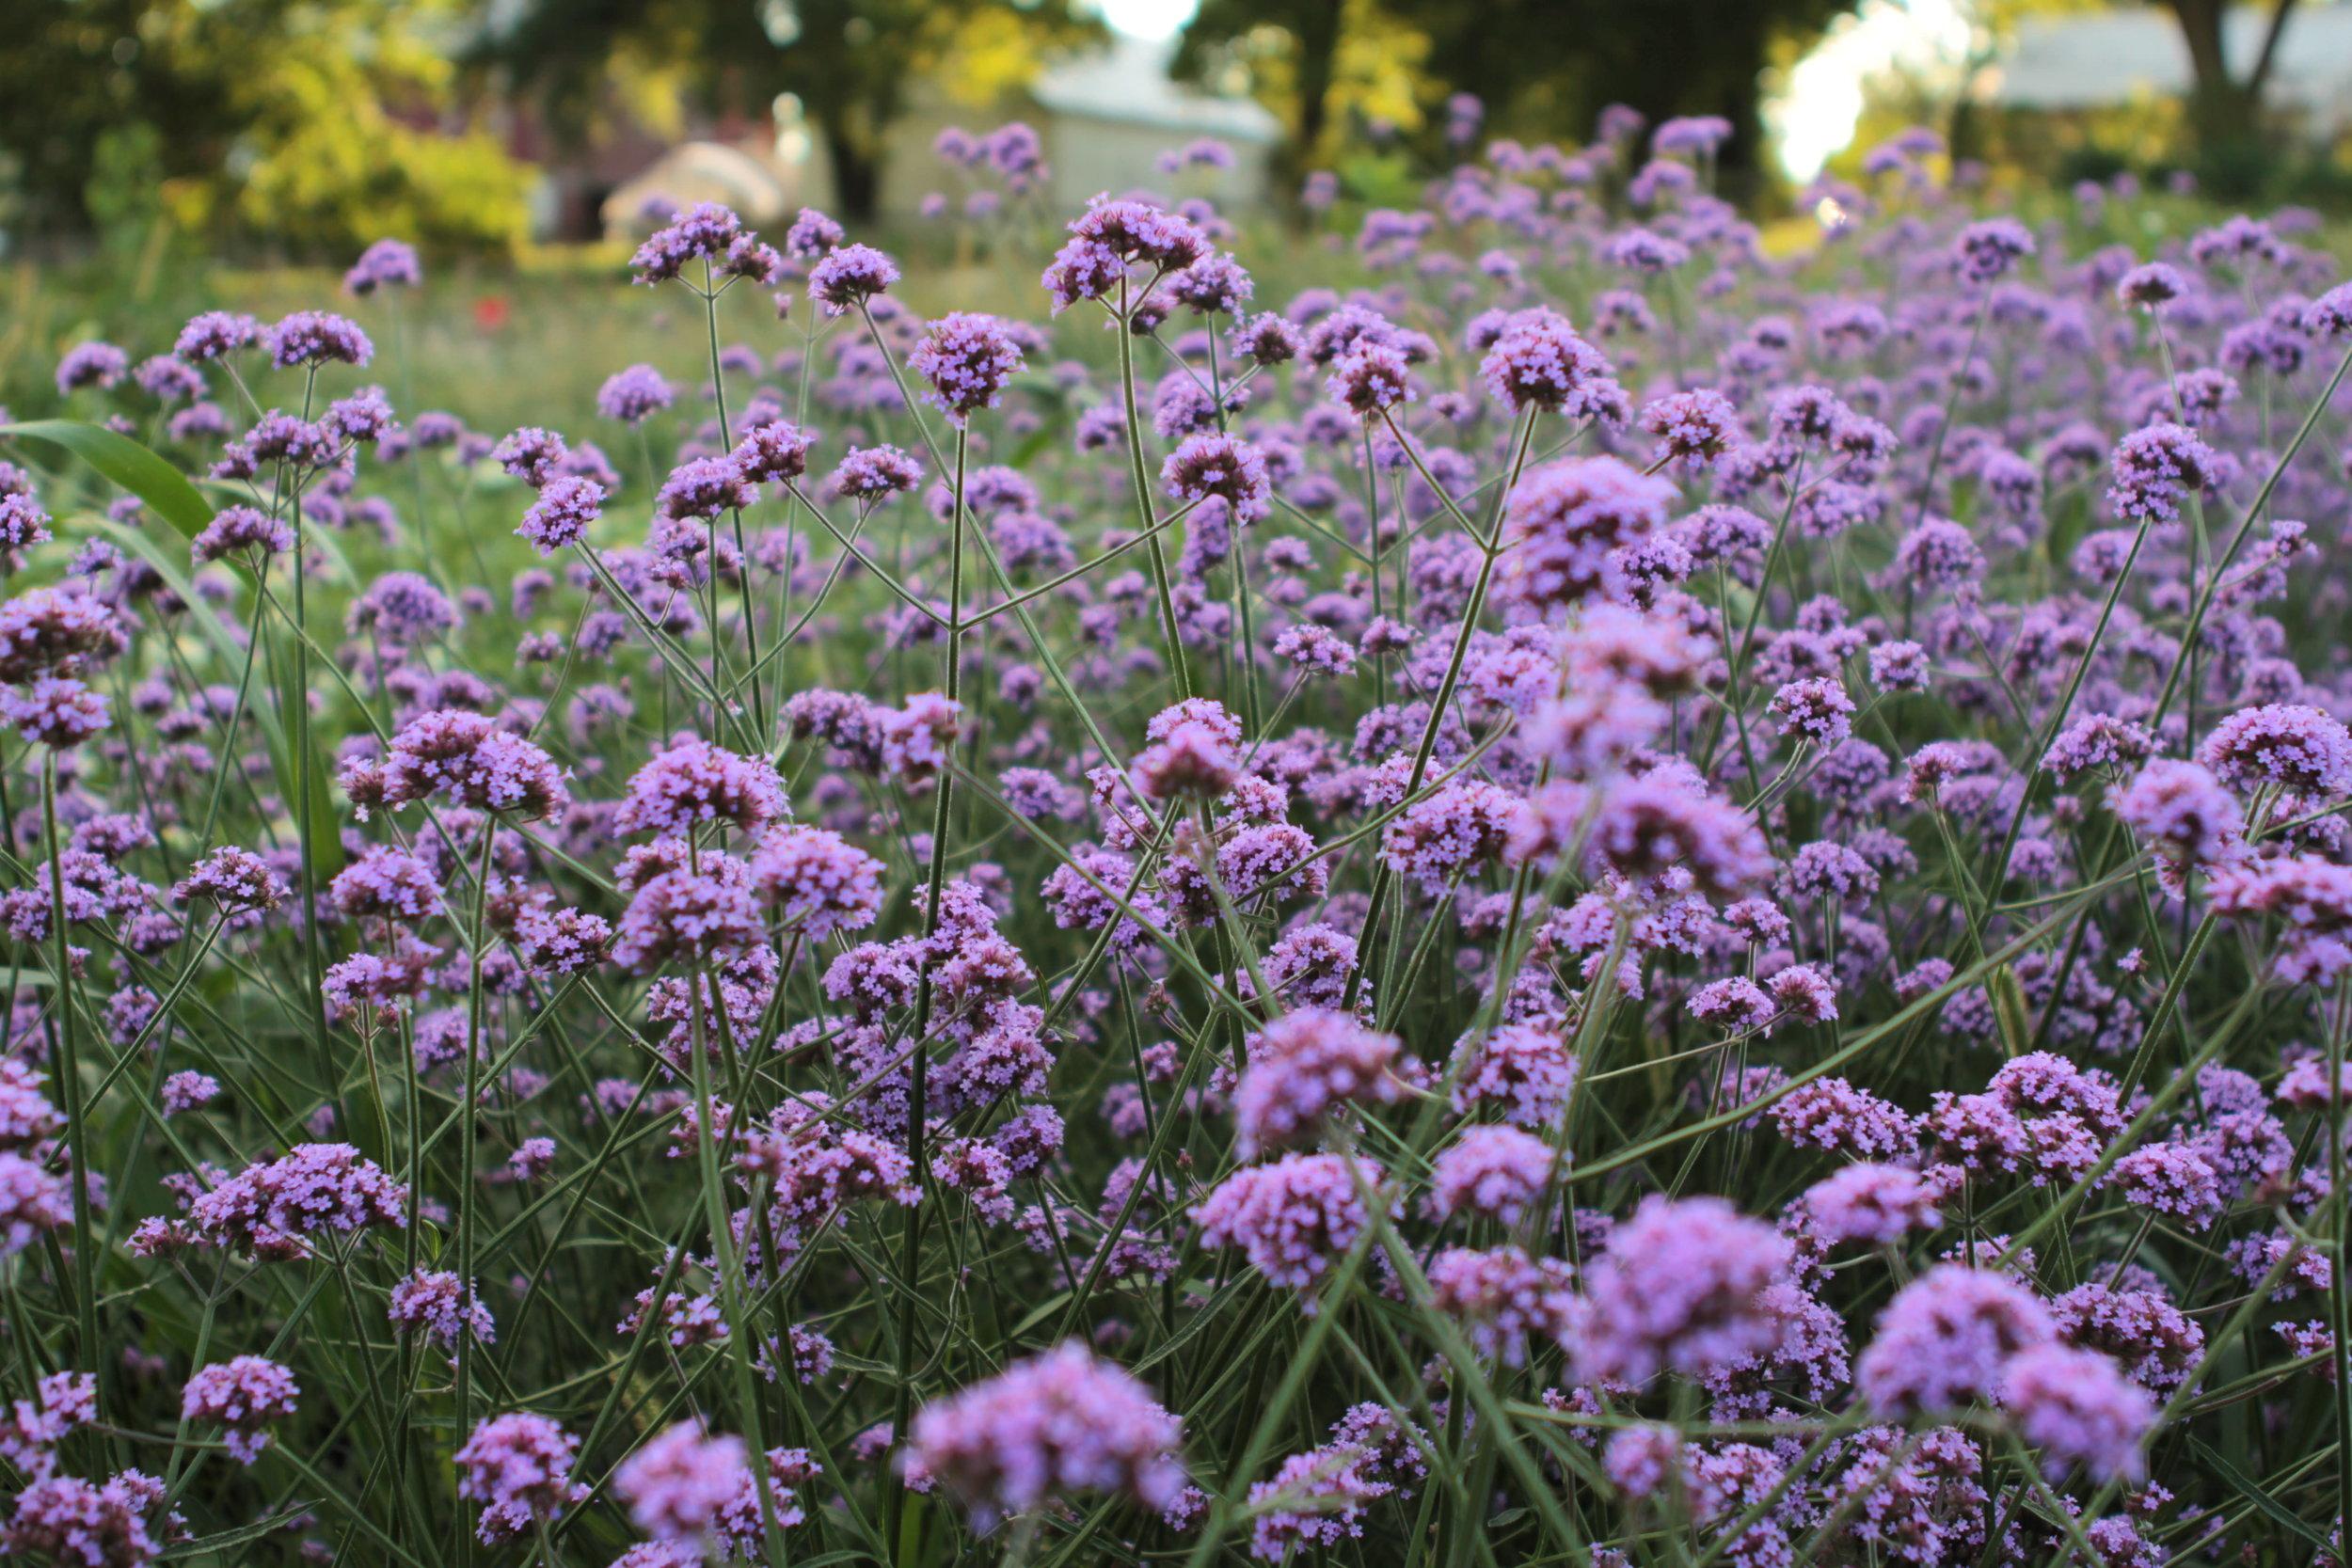 Verbena - Not a great cut, but definitely a pollinator favorite!